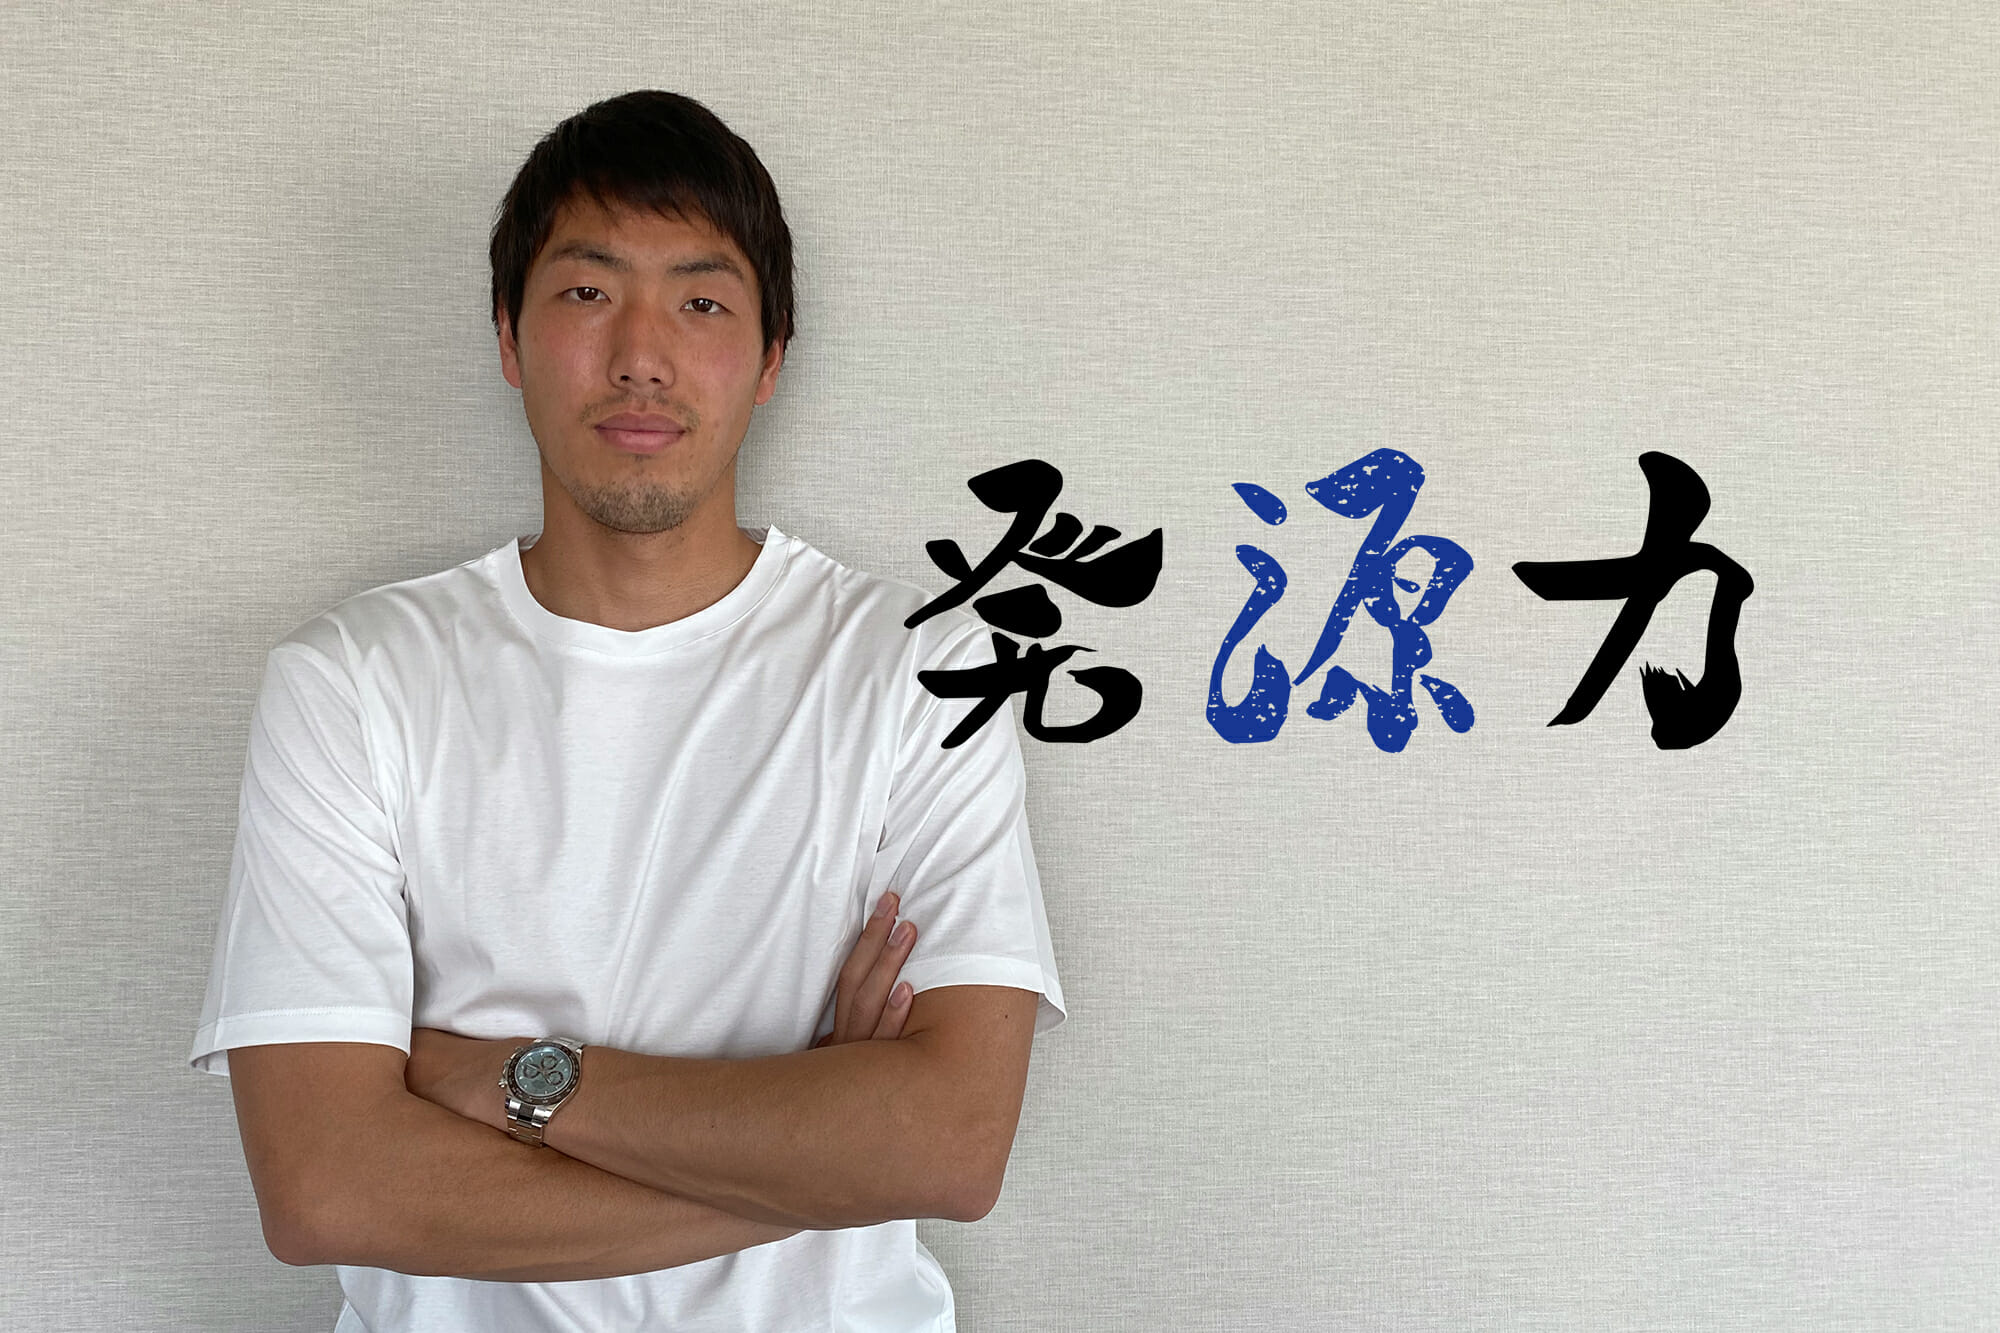 Vol.2 Jリーグ復帰の決断①